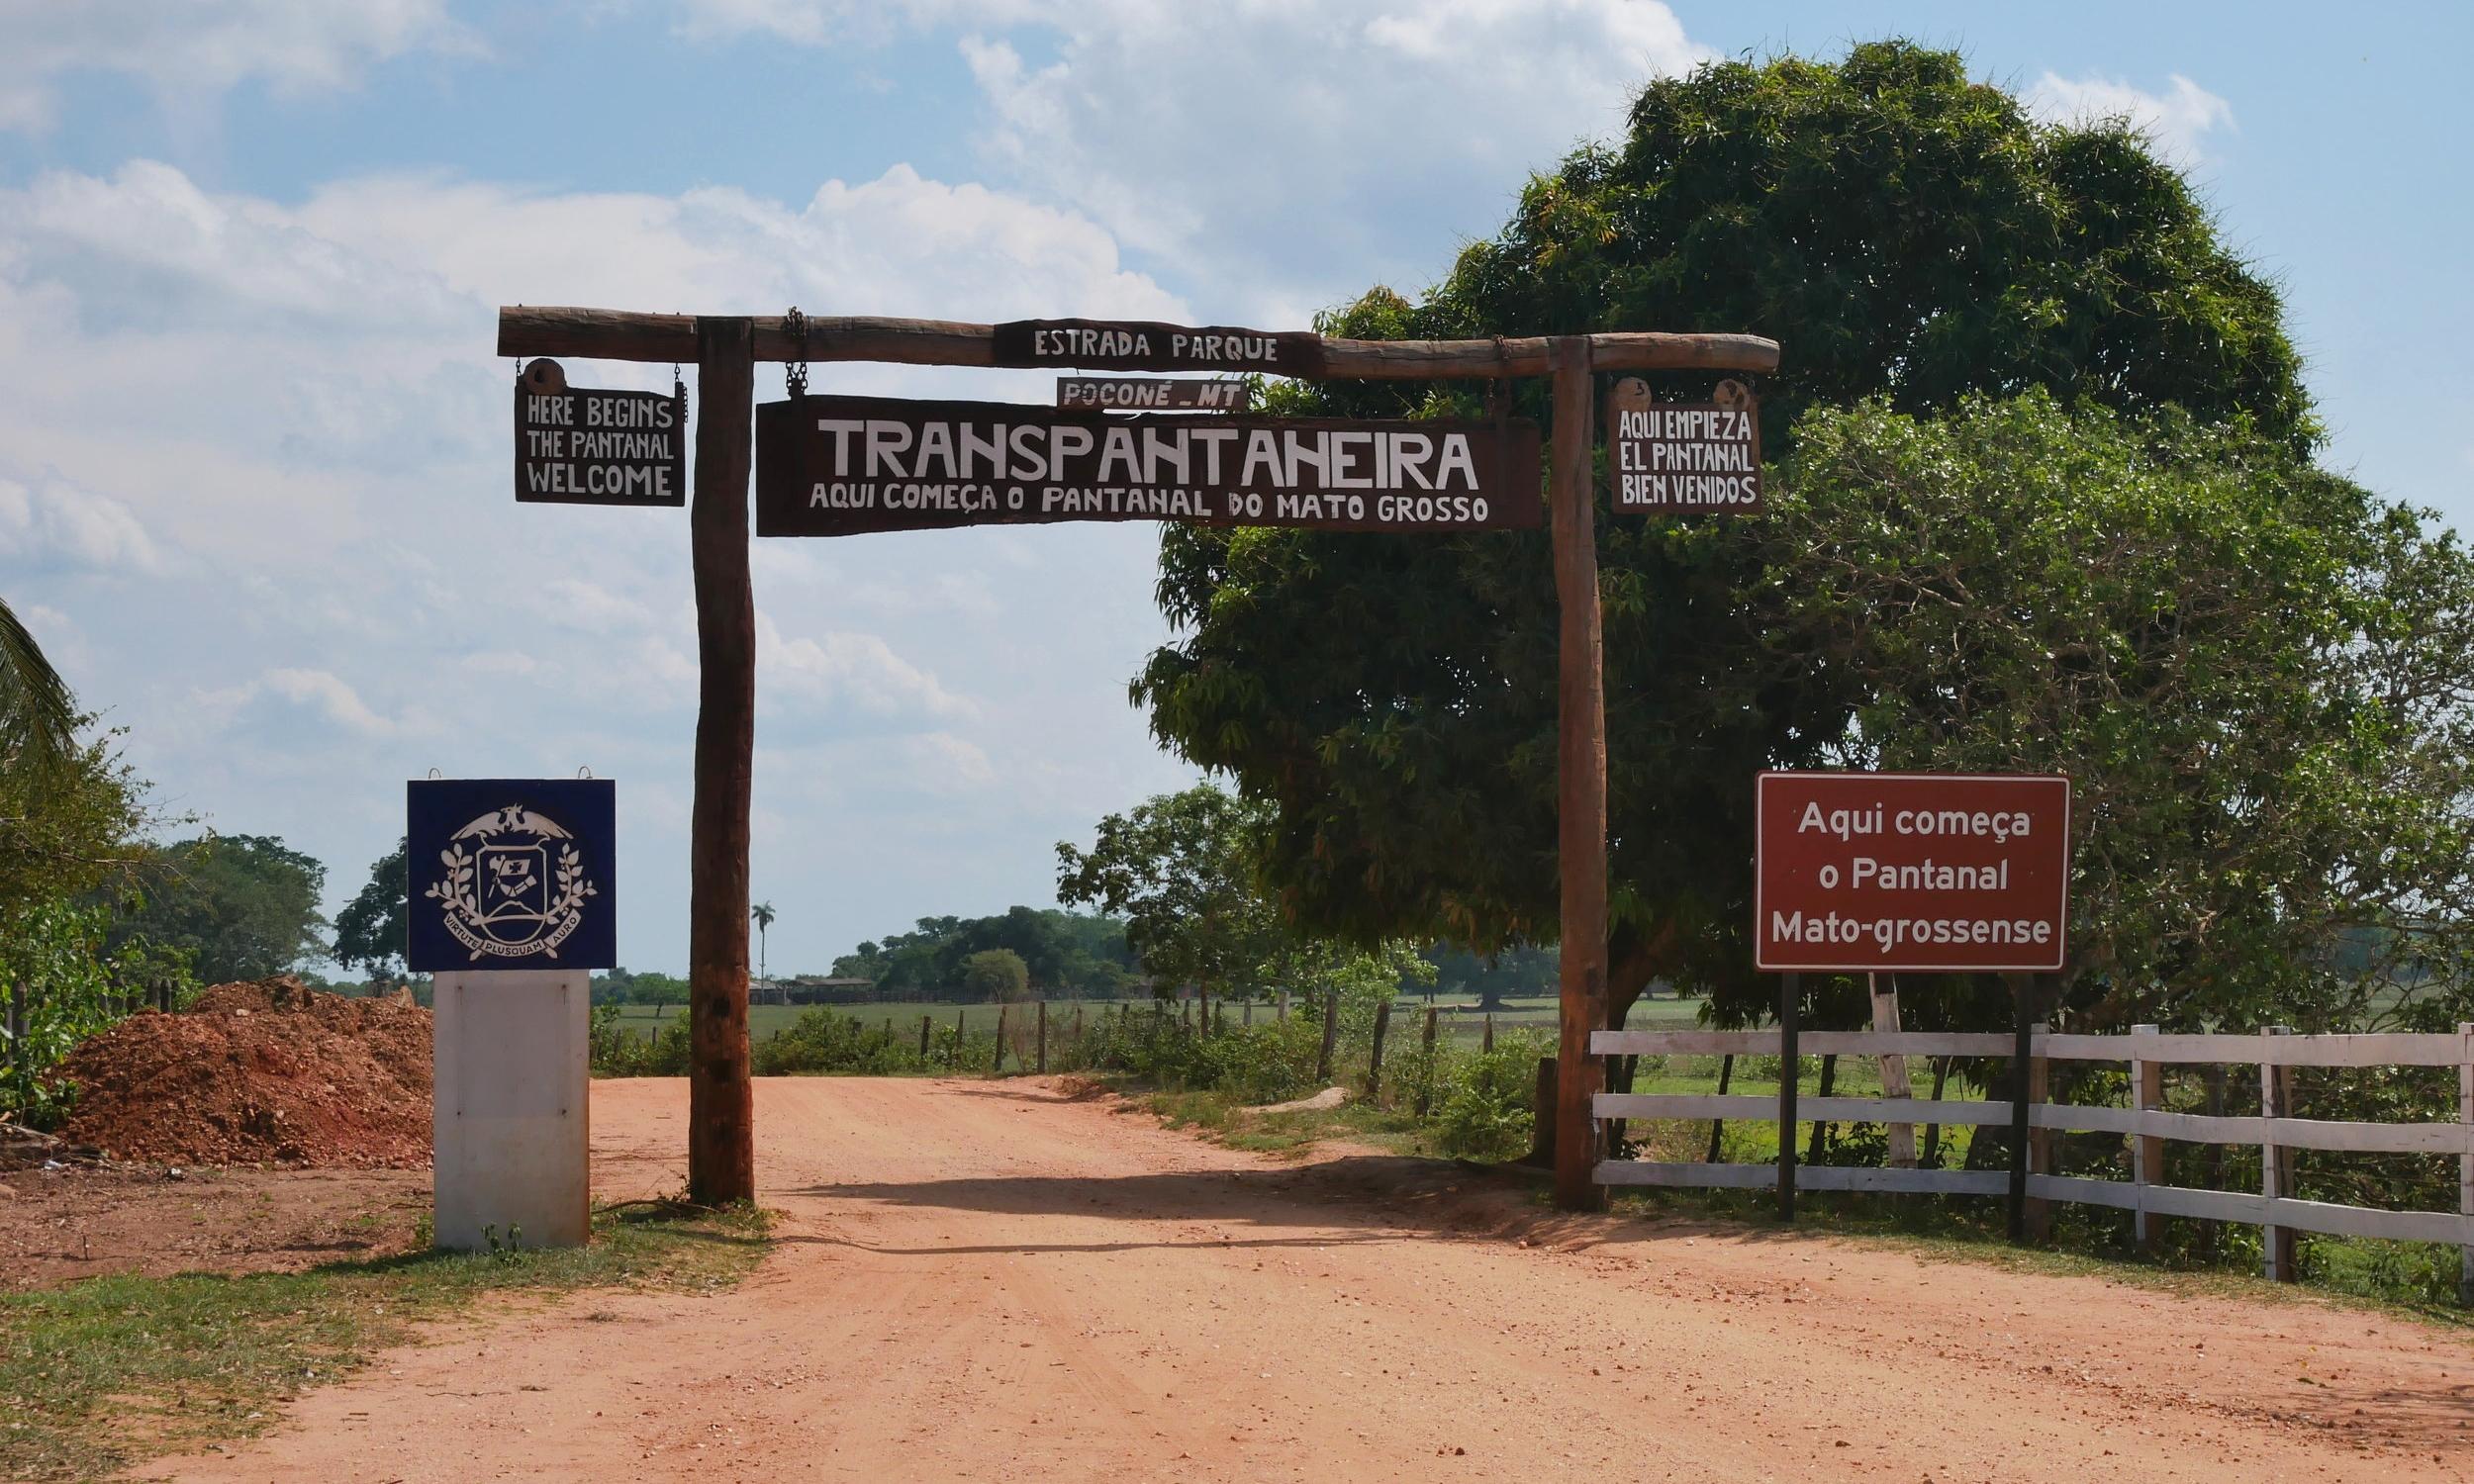 Entrance to the Pantanal